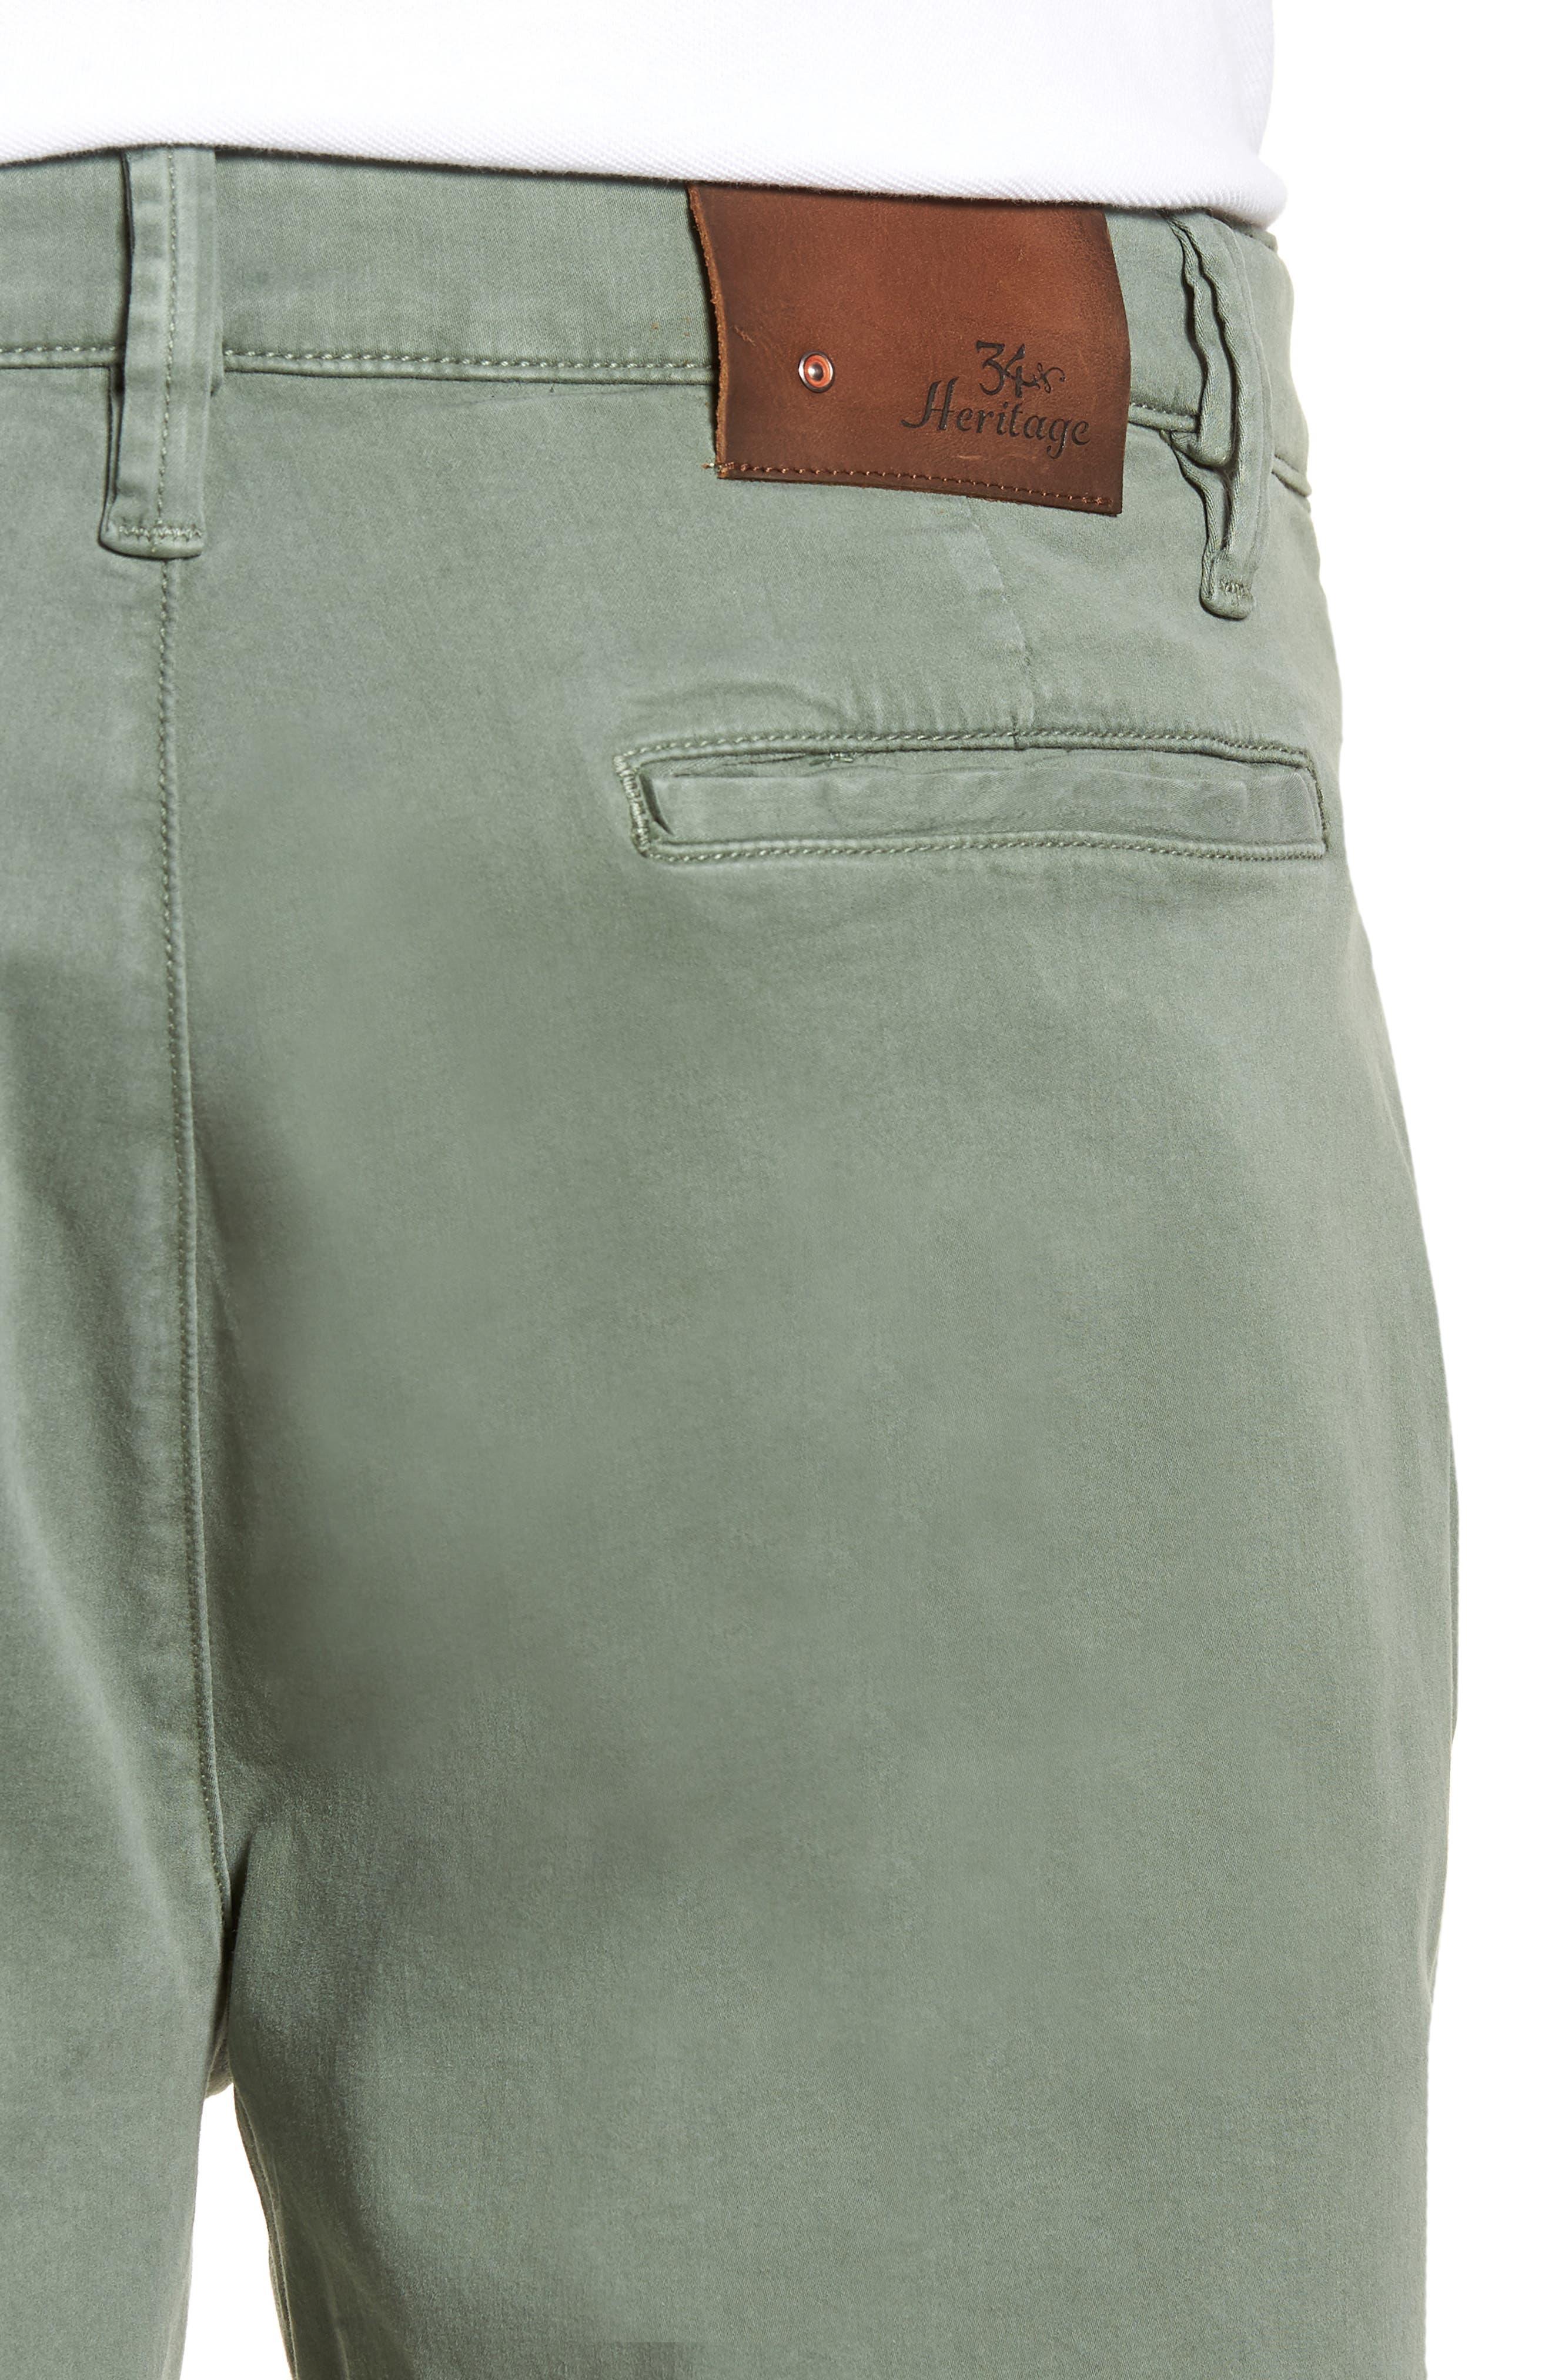 34 HERITAGE,                             Nevada Twill Shorts,                             Alternate thumbnail 4, color,                             MOSS TWILL